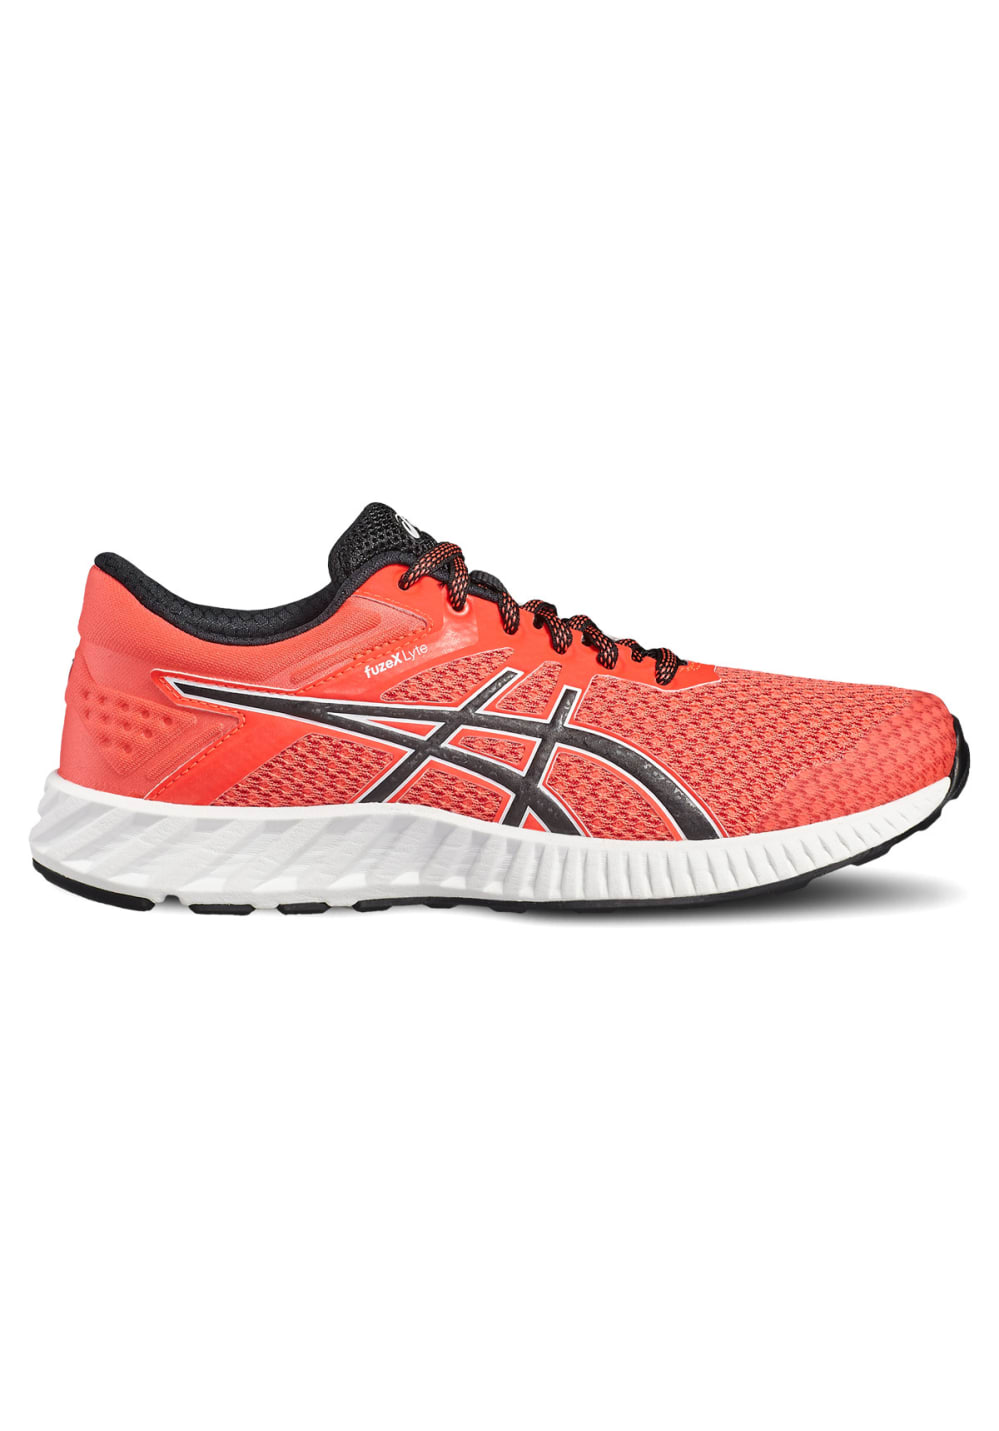 grand choix de 7200a 4b0d1 ASICS fuzeX Lyte 2 - Running shoes for Women - Orange